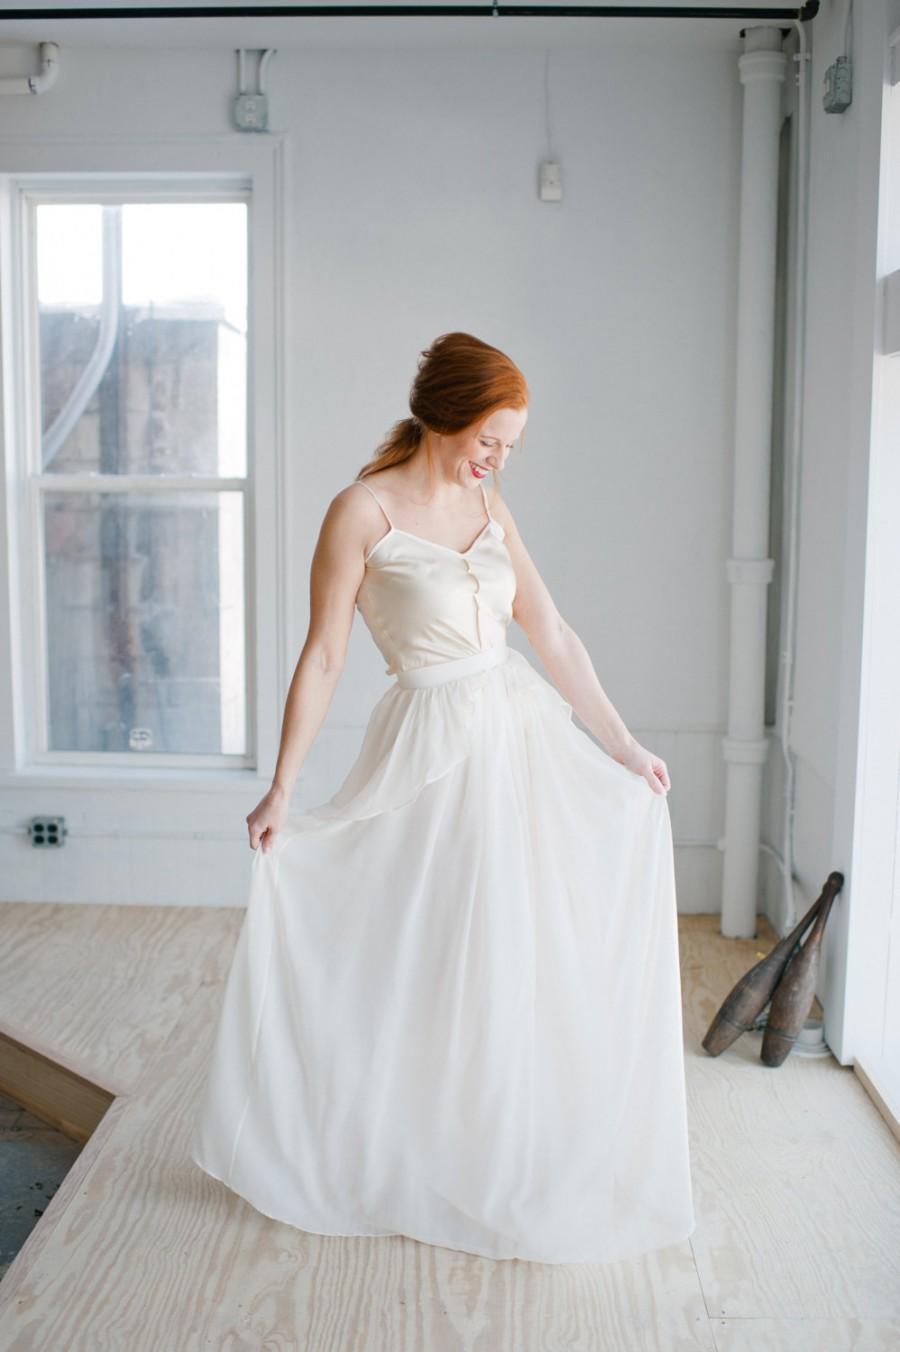 Wedding - Cecily Wedding Dress; Handmade Wedding Dress, beautiful chiffon skirt with cascading peplum and shiny silky camisole